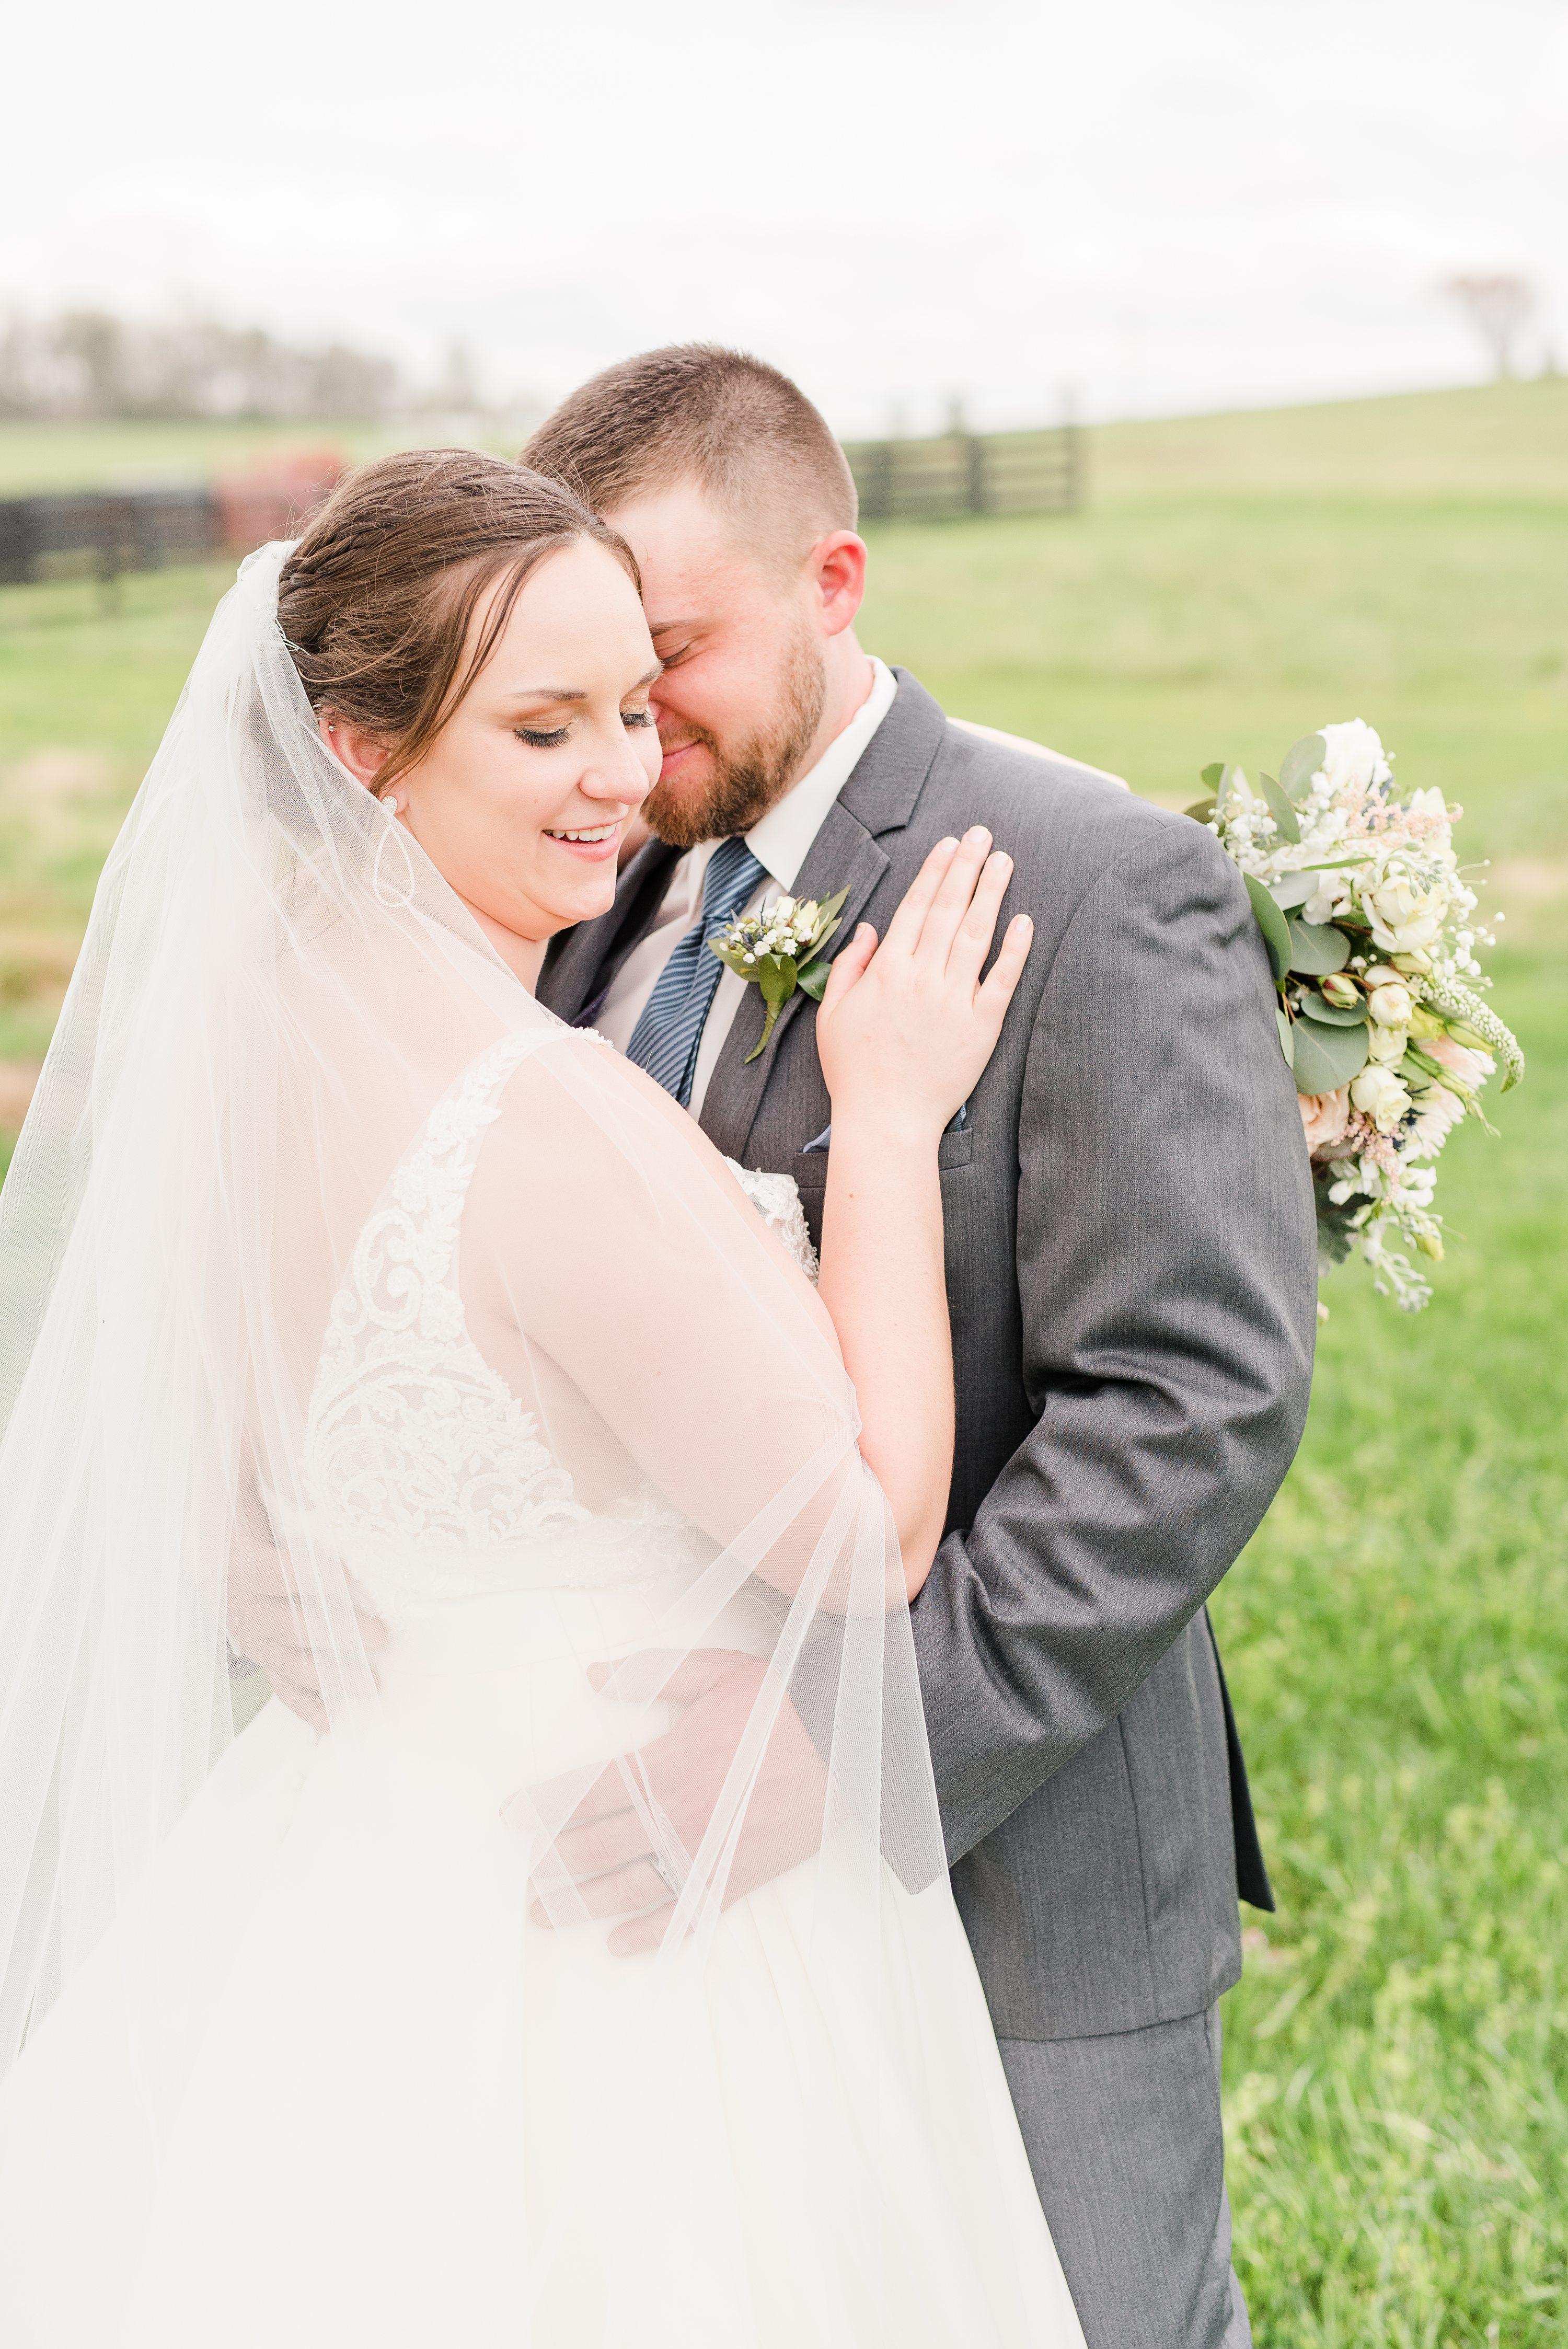 Virginia Wedding Photographer,Spring,bride and groom,mountain wedding,edgewood barn